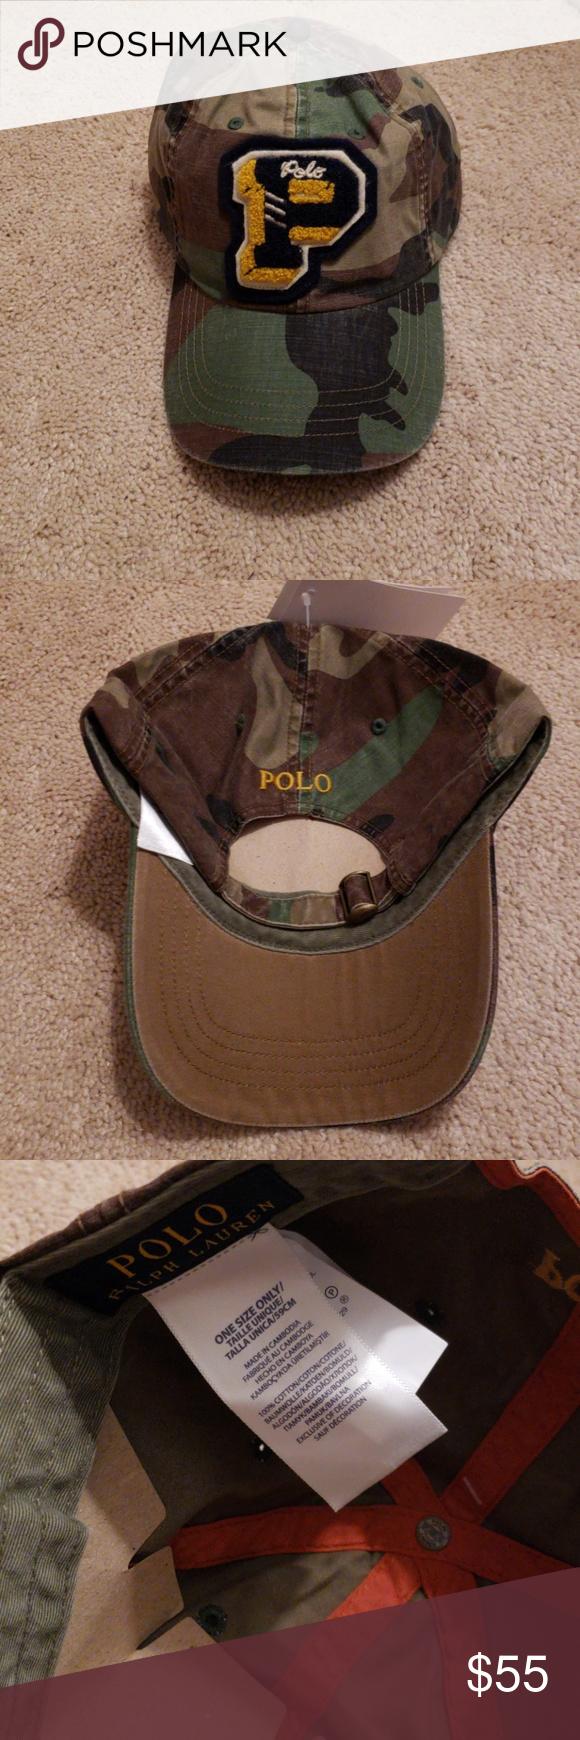 63d3853c98b Polo Ralph Lauren baseball cap Limited Edition camo baseball cap.. 100%  cotton Check out my closet for limited edition polo bear Polo by Ralph  Lauren ...